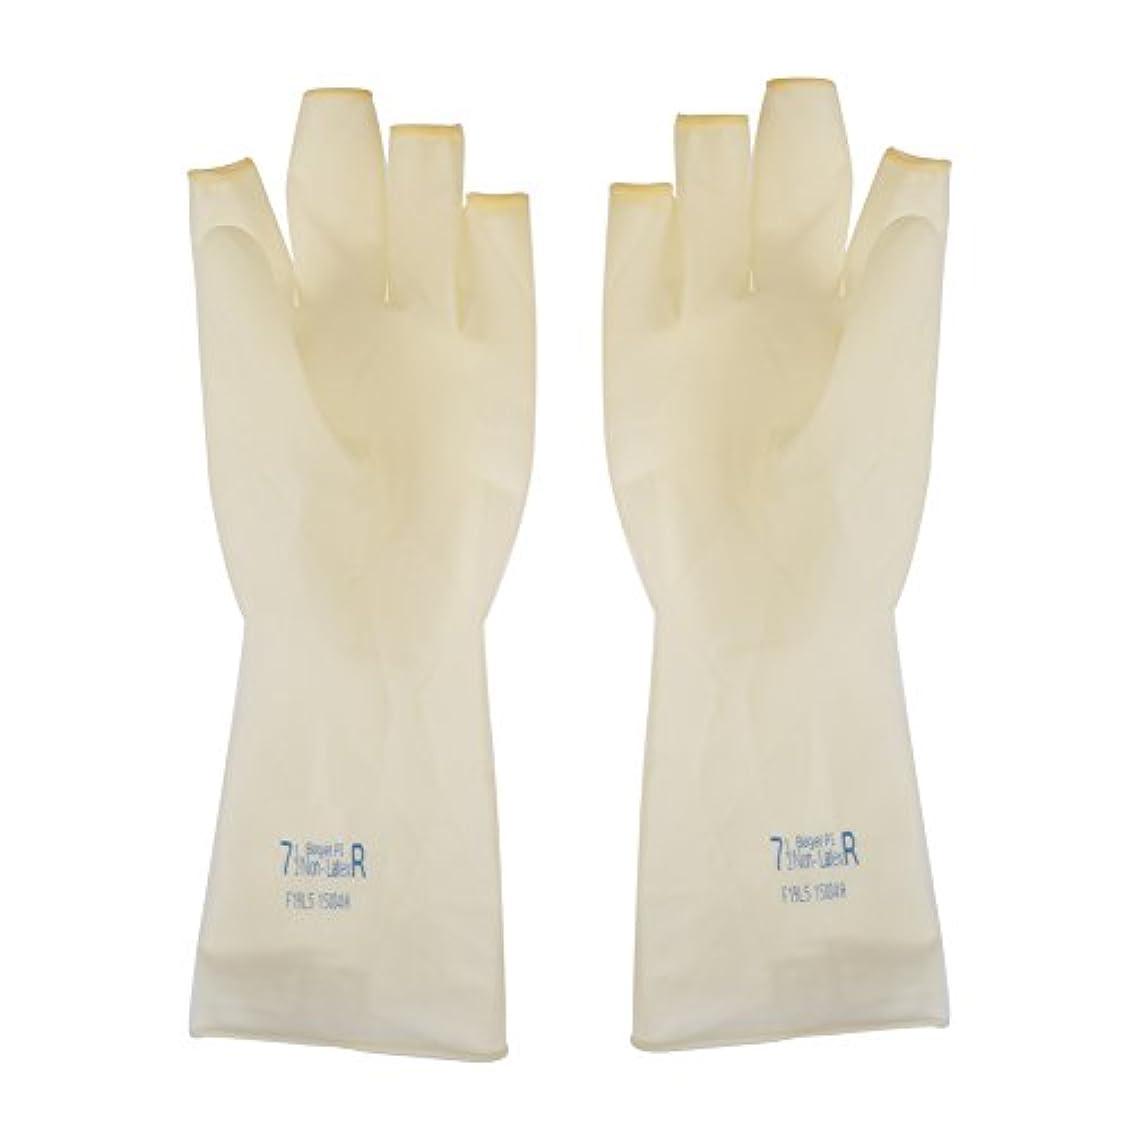 AEdiea 1ペア ゴム手袋   毛染め手袋 使い捨て 弾性 伸縮性 ヘアサロン サロンツール (M)